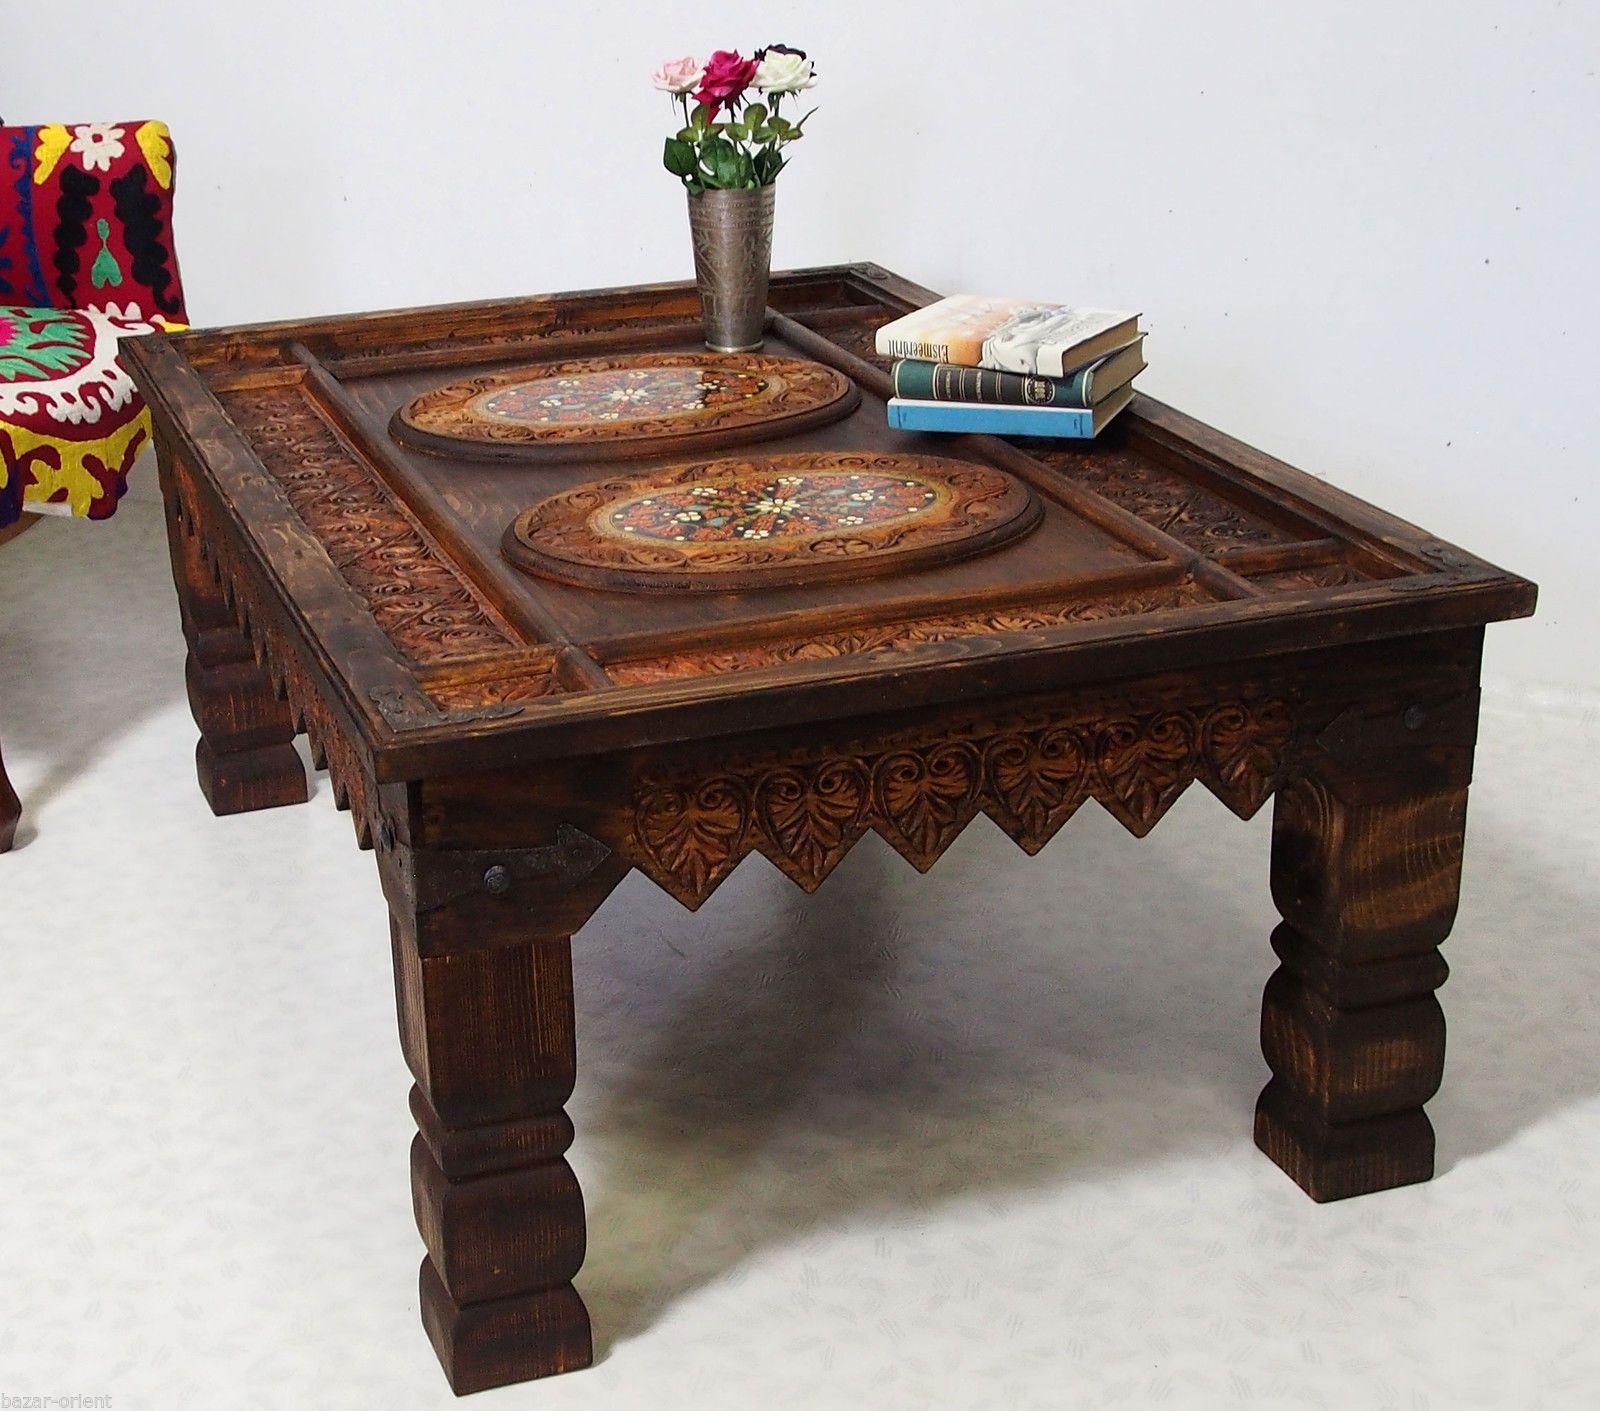 130x87cm antik kolonial Wohnzimmertisch tischtruhe Tisch